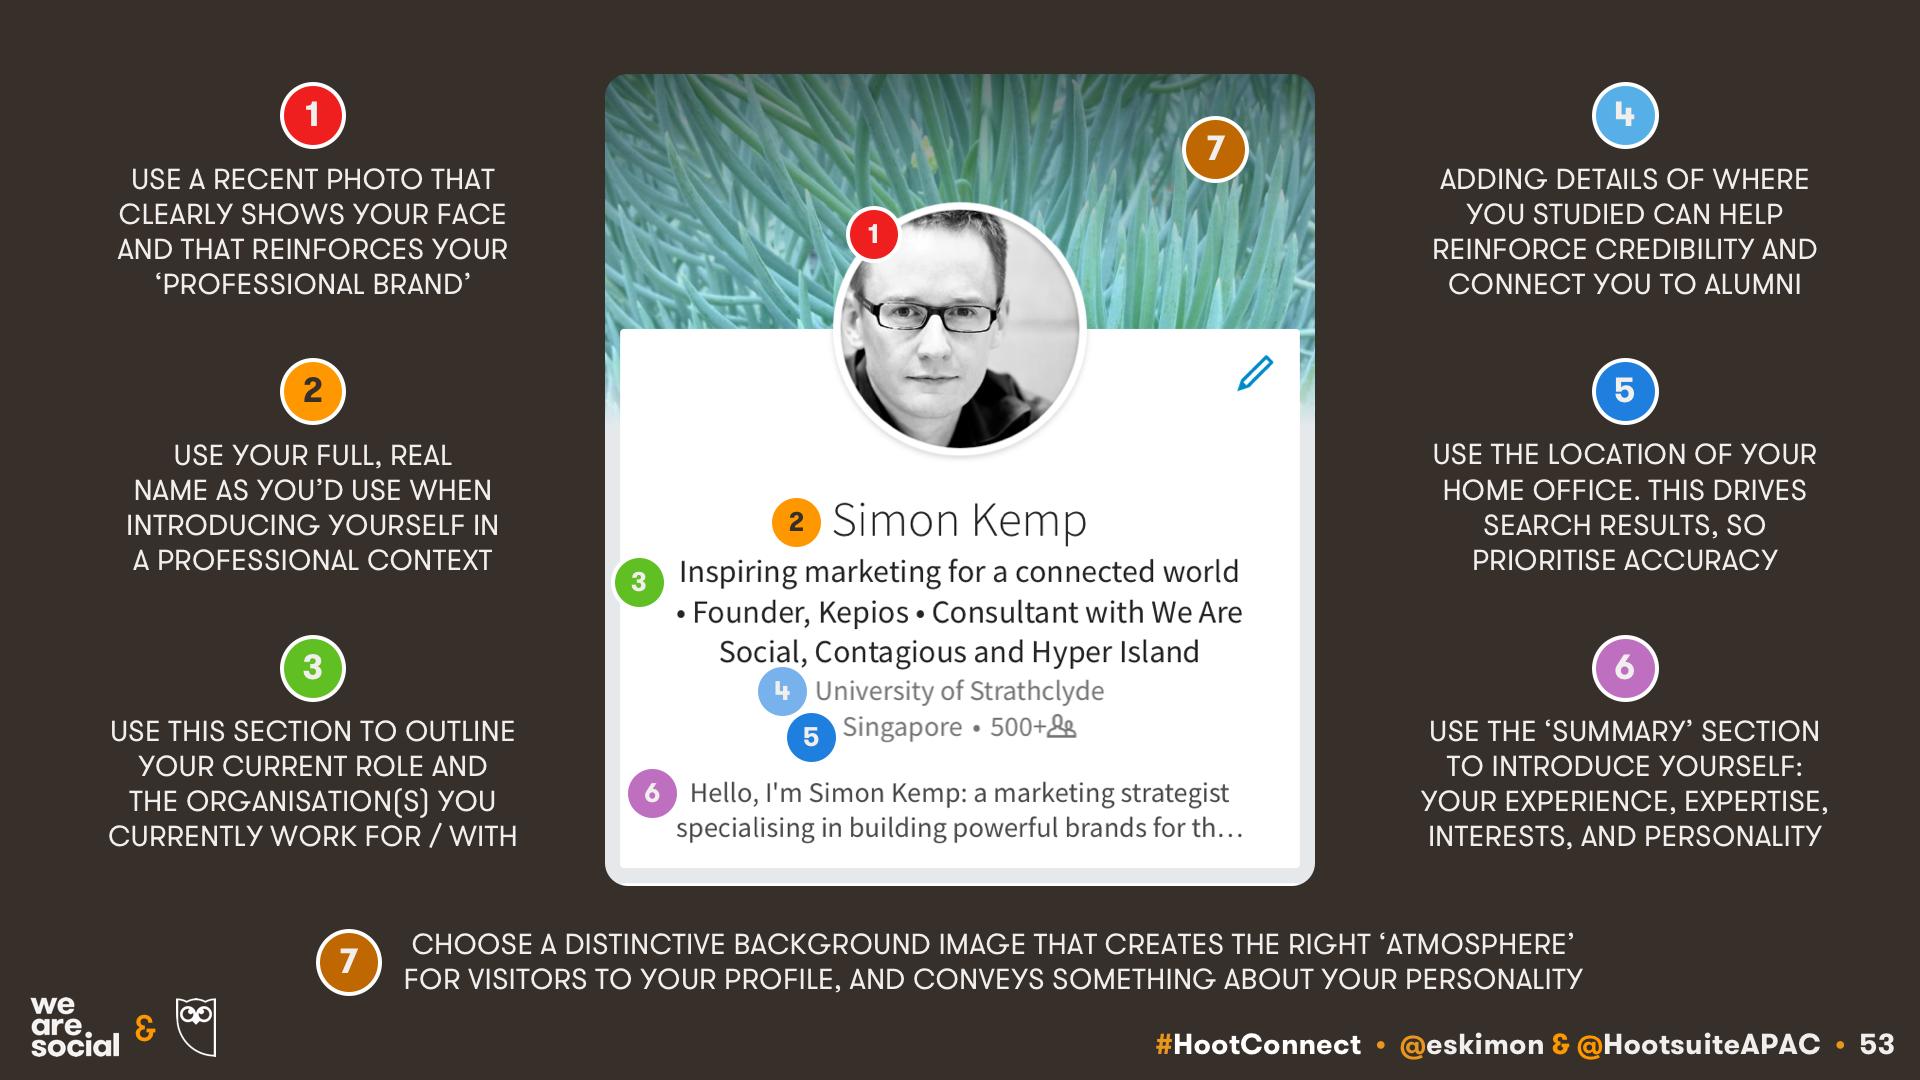 KEPIOS: MAKE THE BEST FIRST IMPRESSION ON LINKEDIN